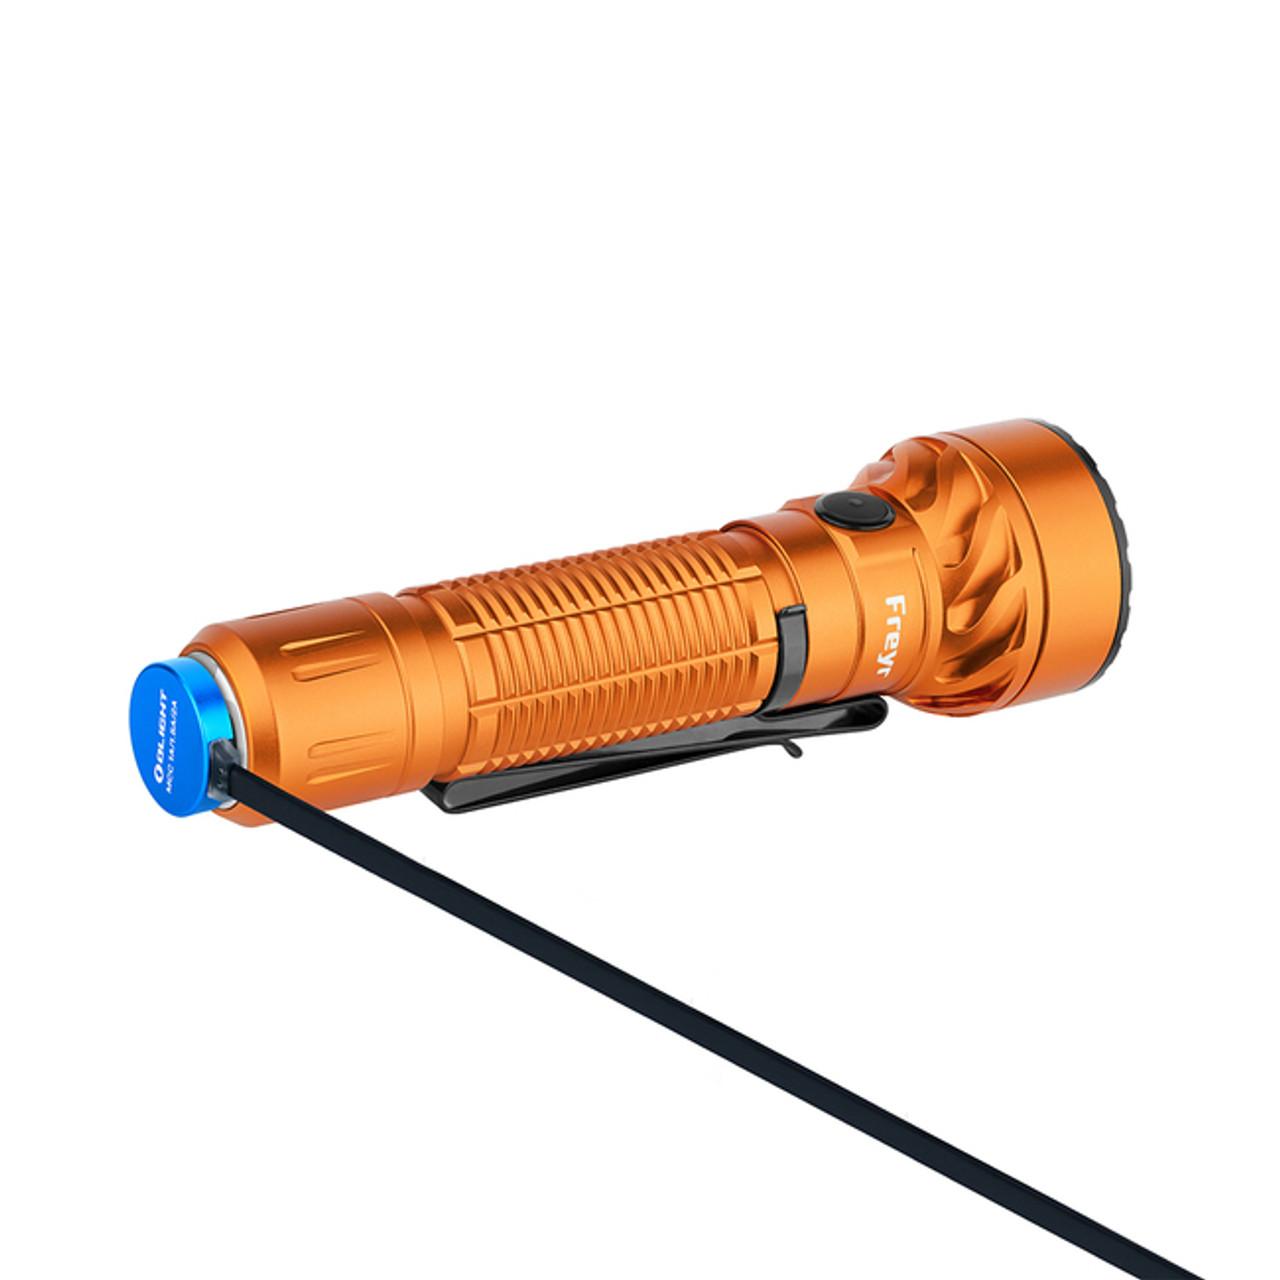 Olight Freyr Orange (Red, Green, And Blue Lights)